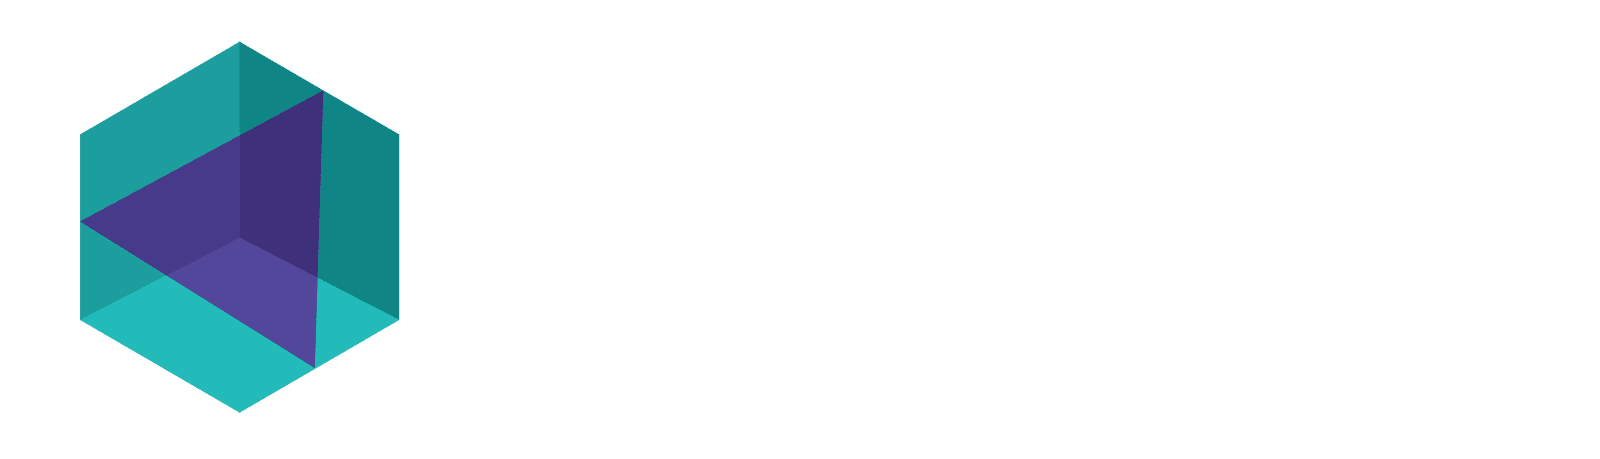 Ivariant